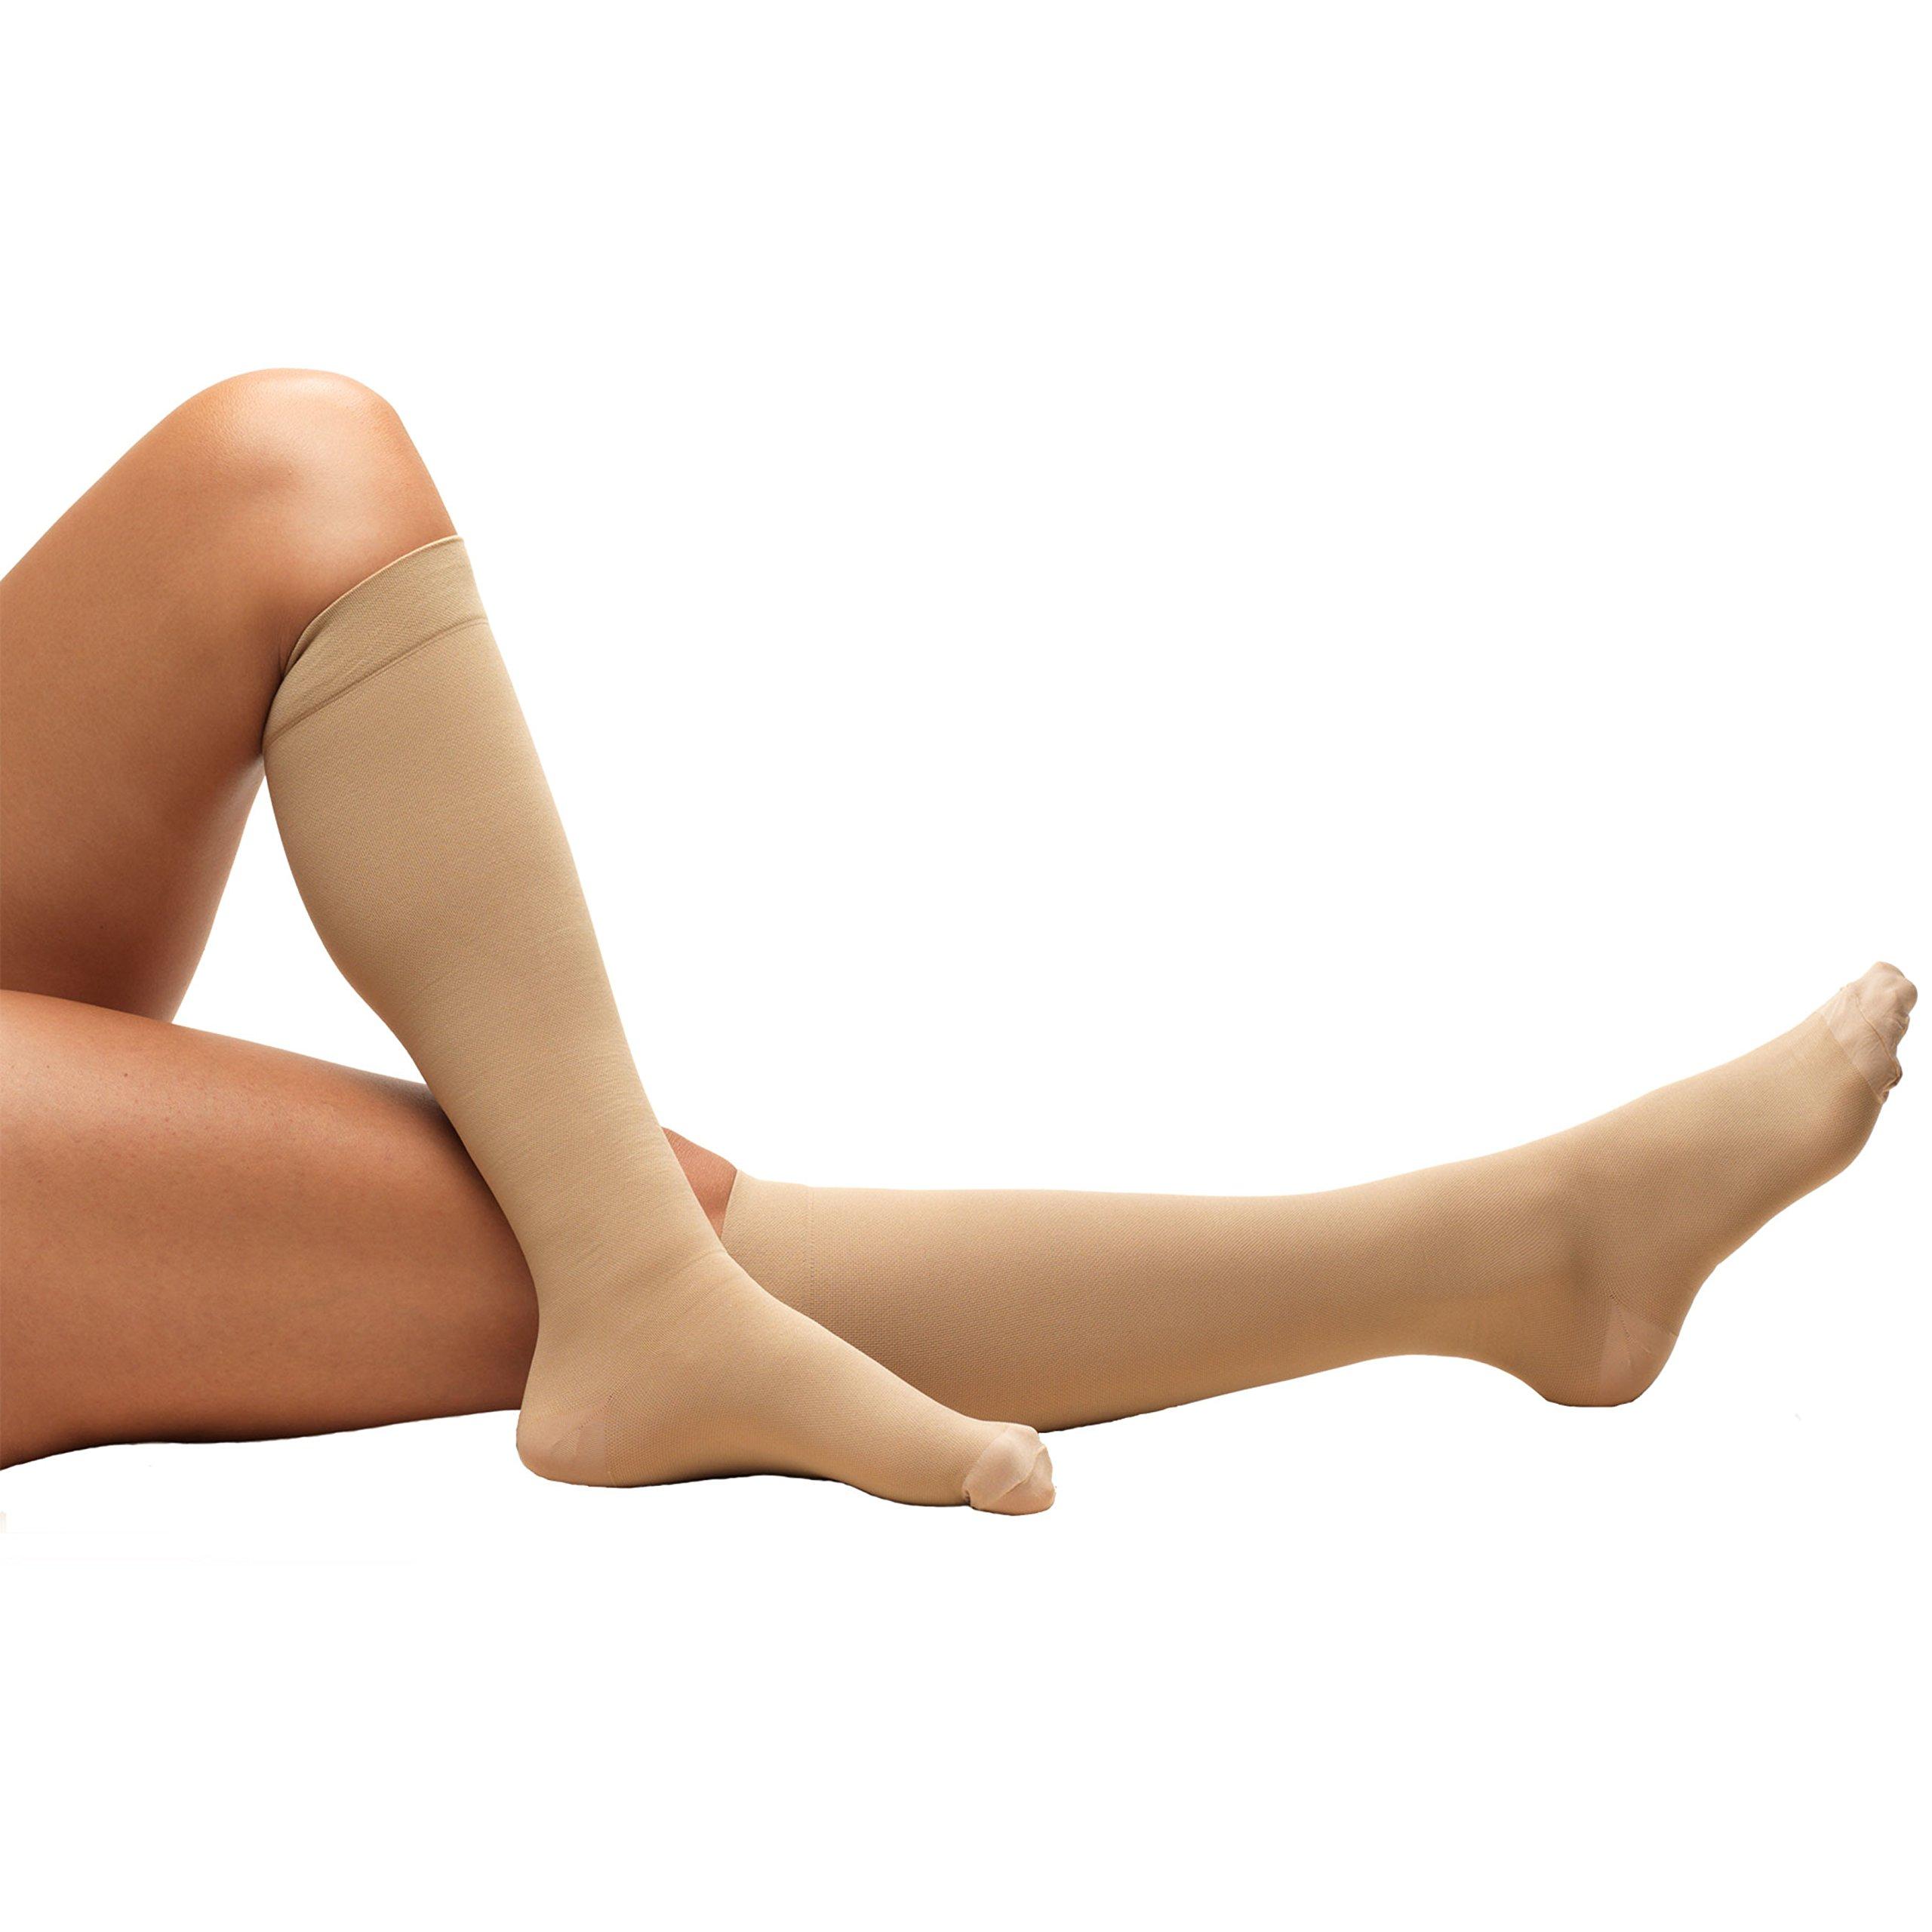 Truform 081257674 Anti-Embolism Stockings, 18 mm, Knee Hi